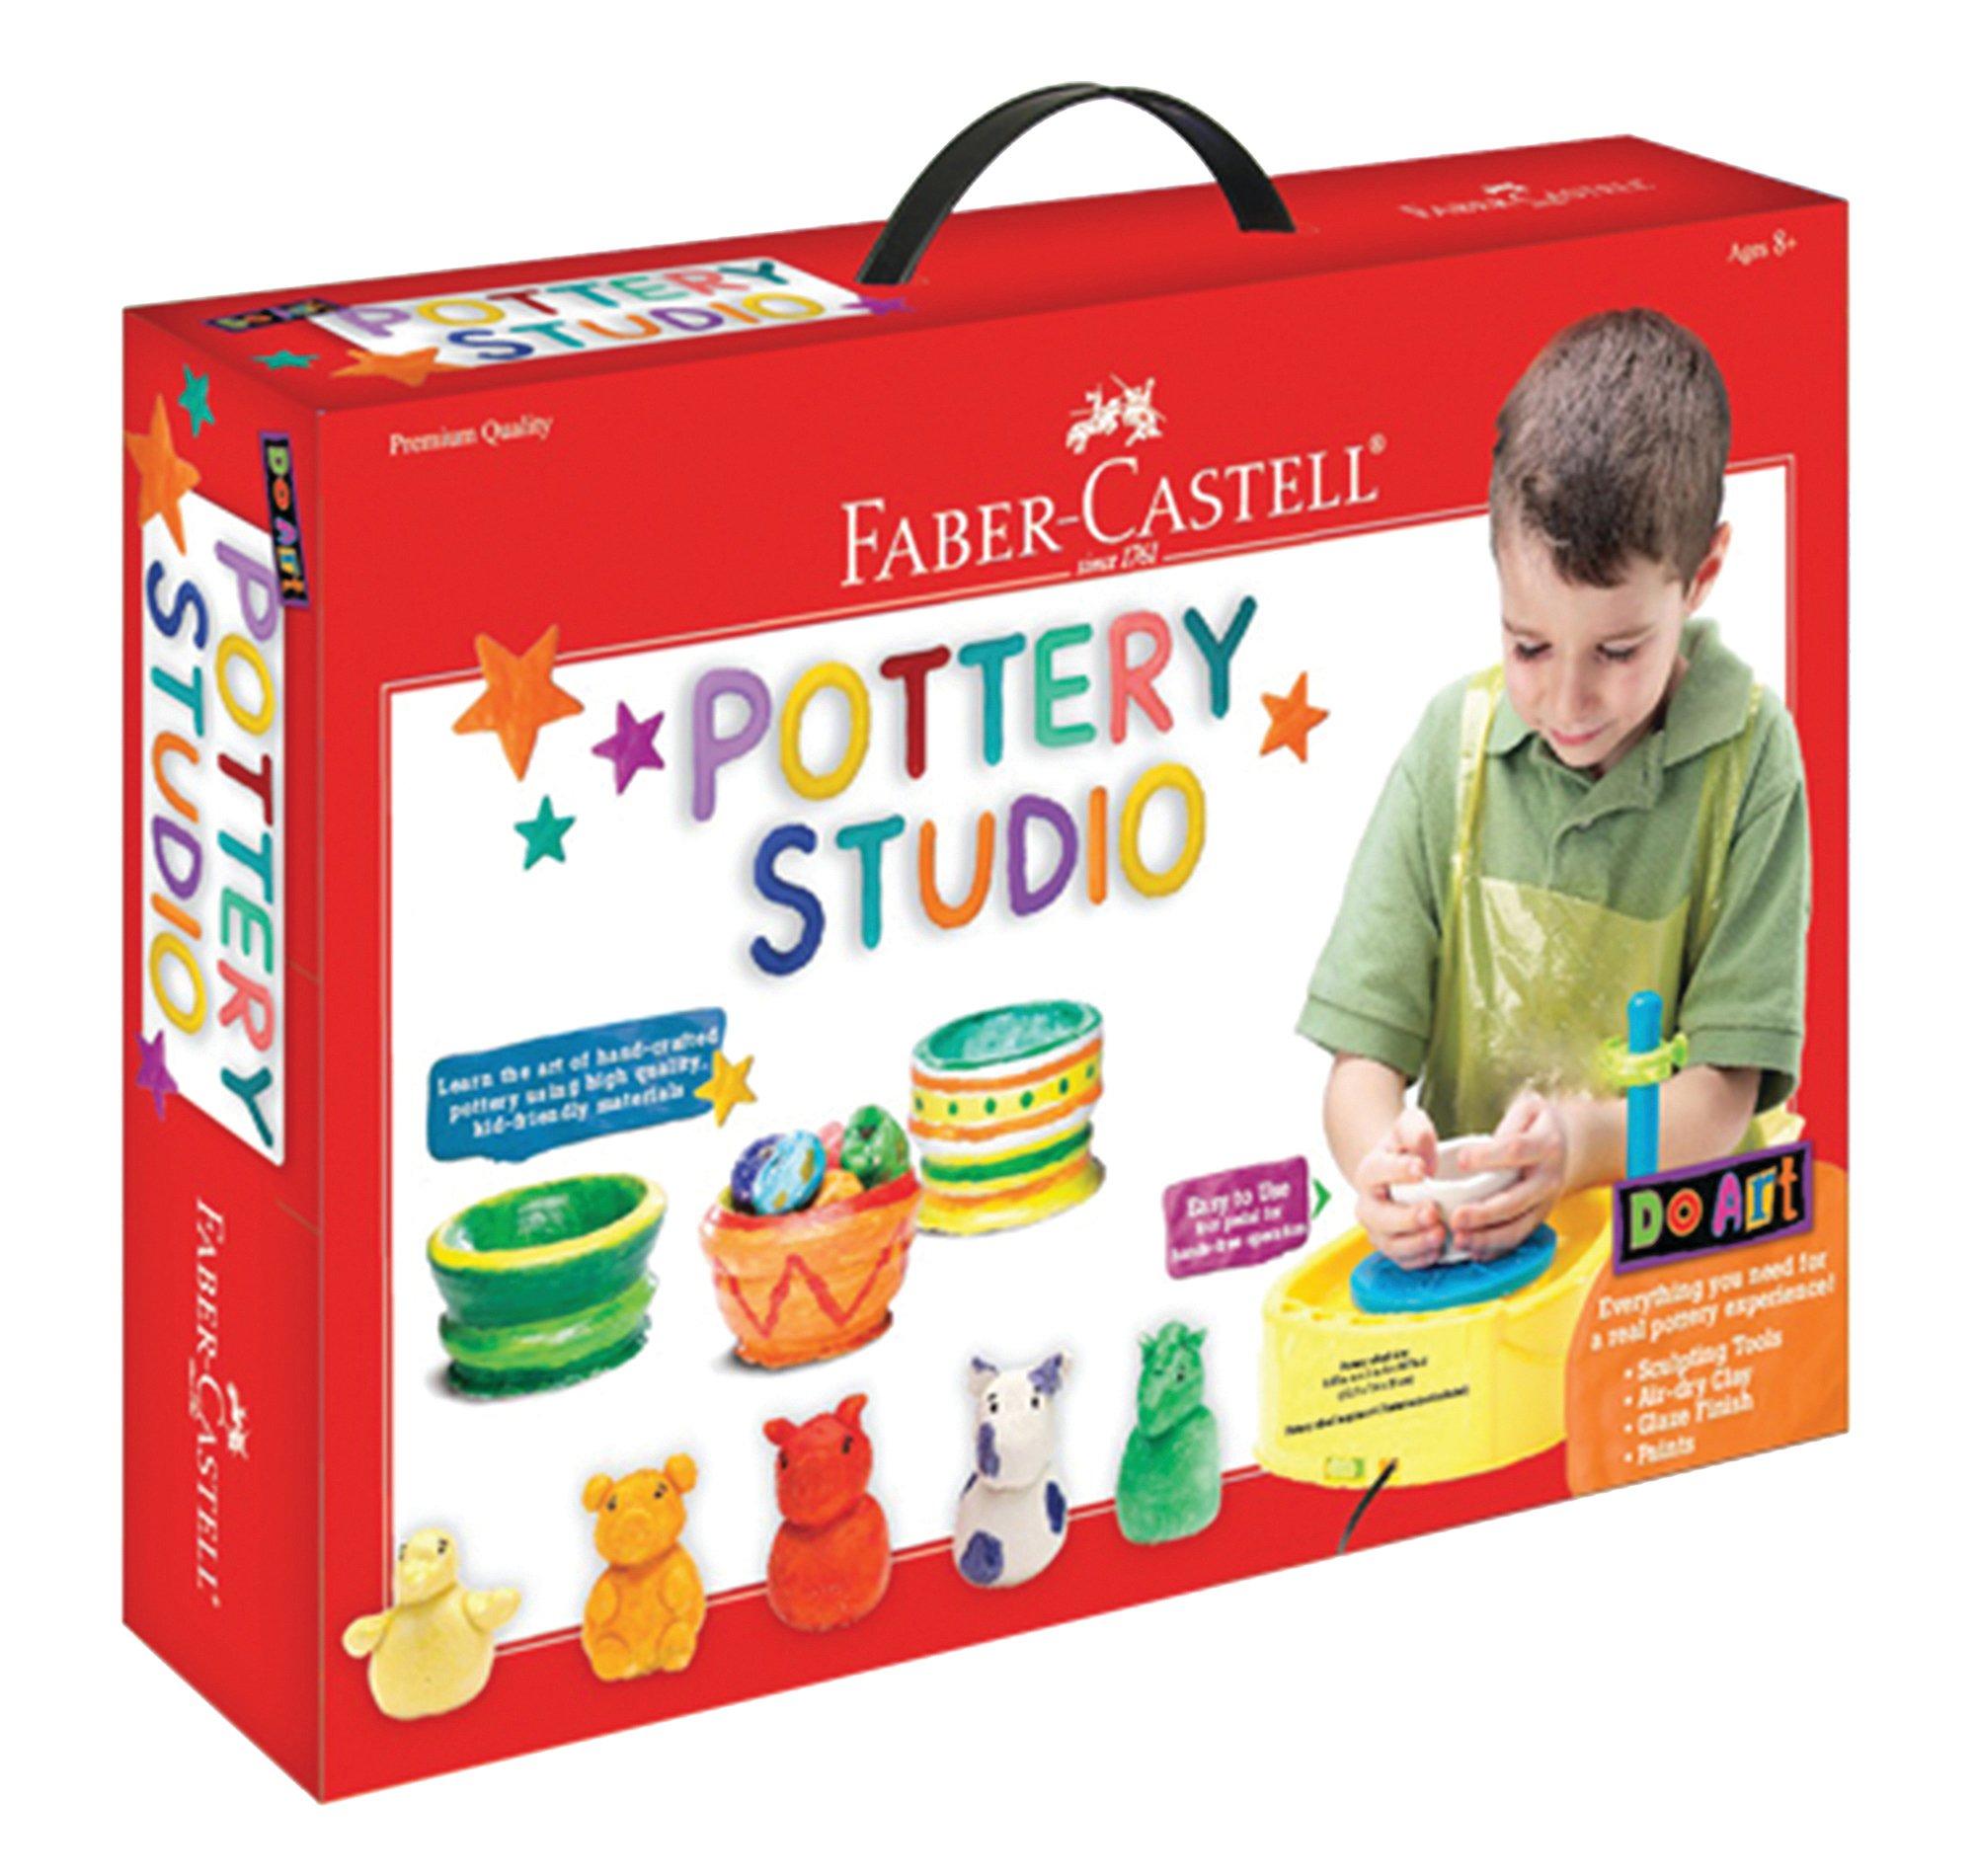 Faber Castell Pottery Studio Wheel Kids